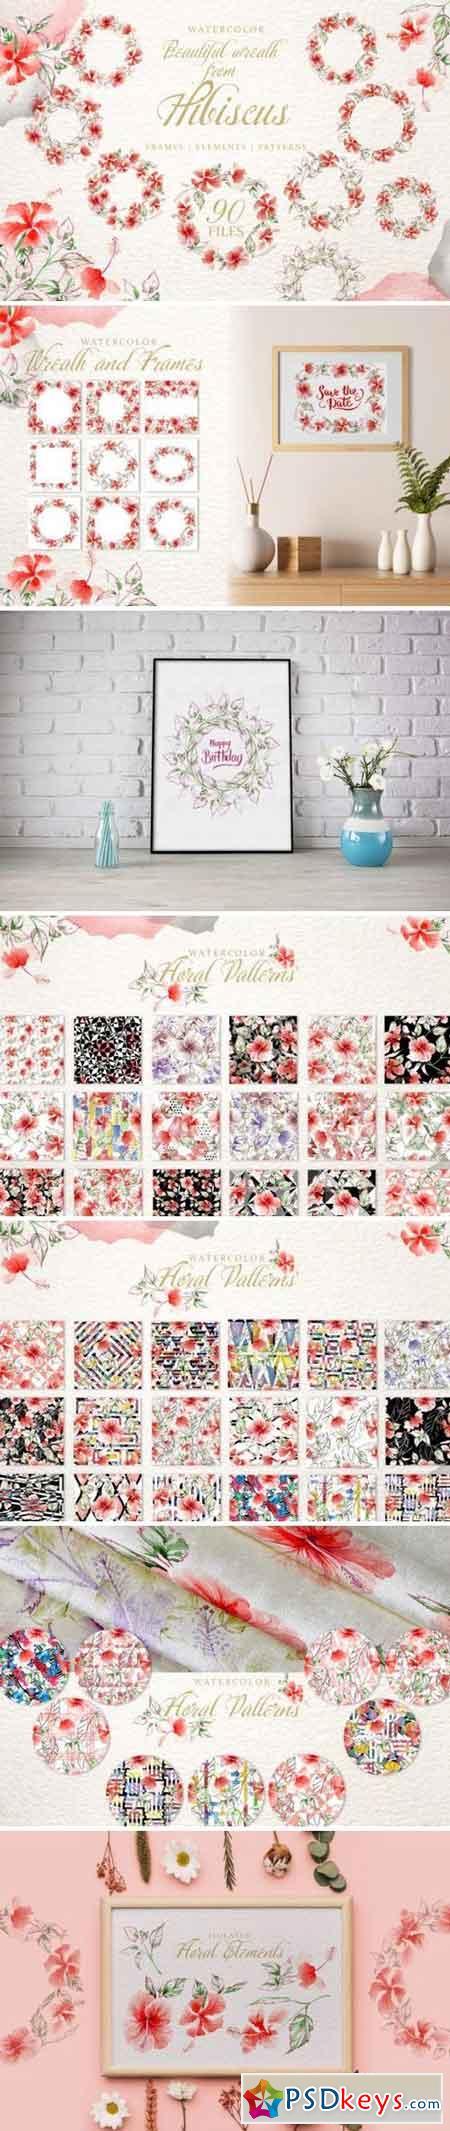 Hibiscus Watercolor png 3358061